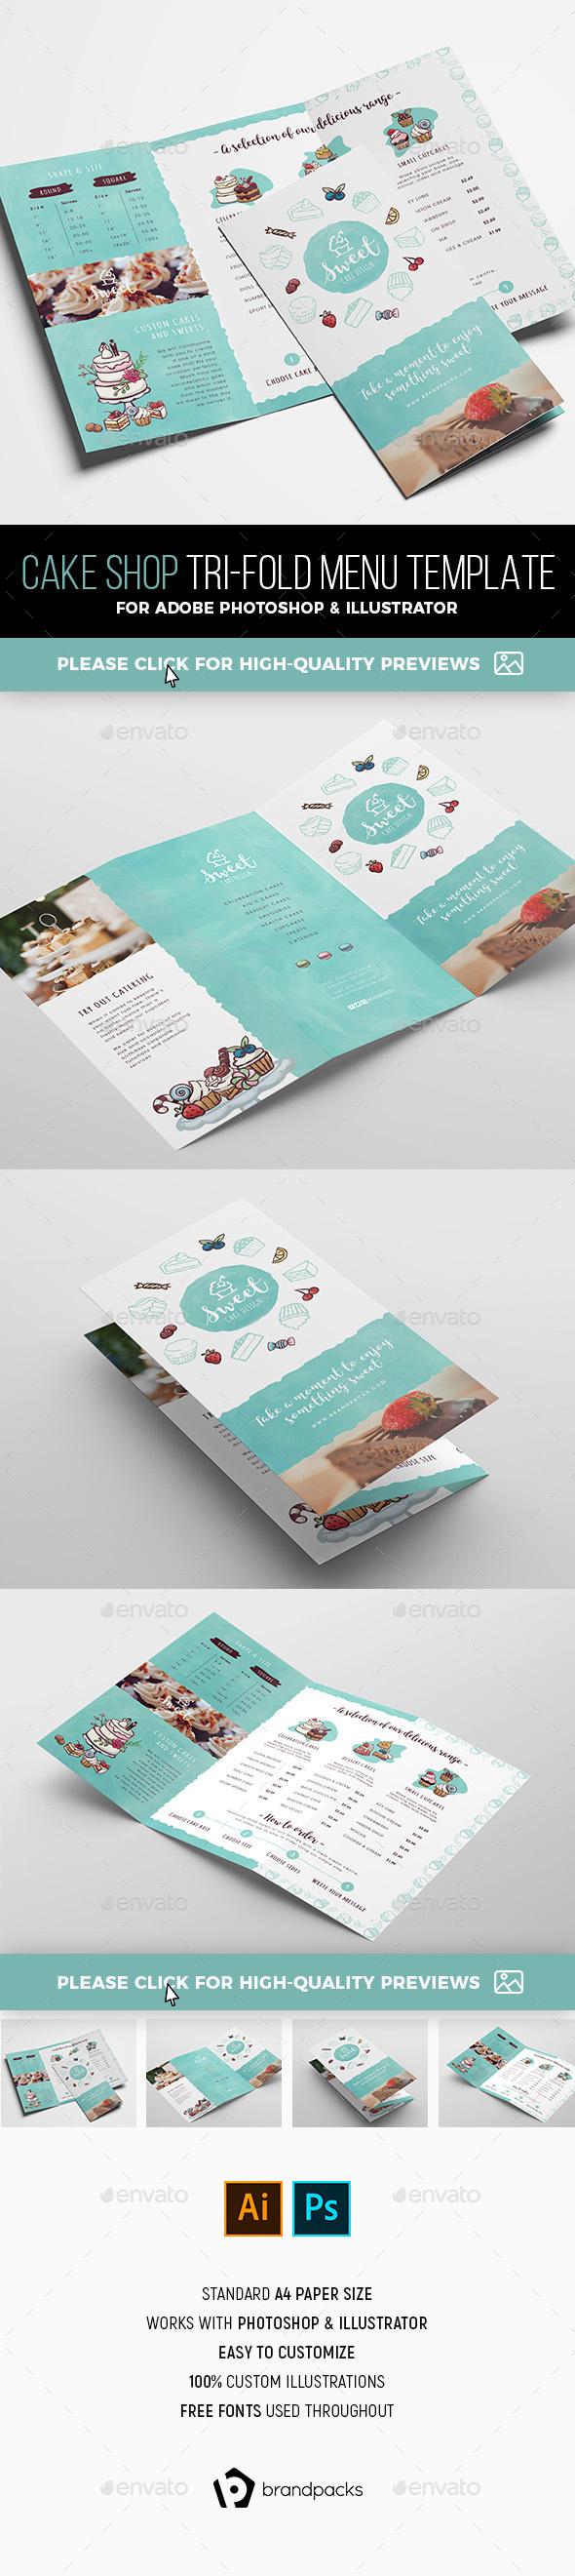 Cake Shop Tri-Fold Brochure Template - Informational Brochures